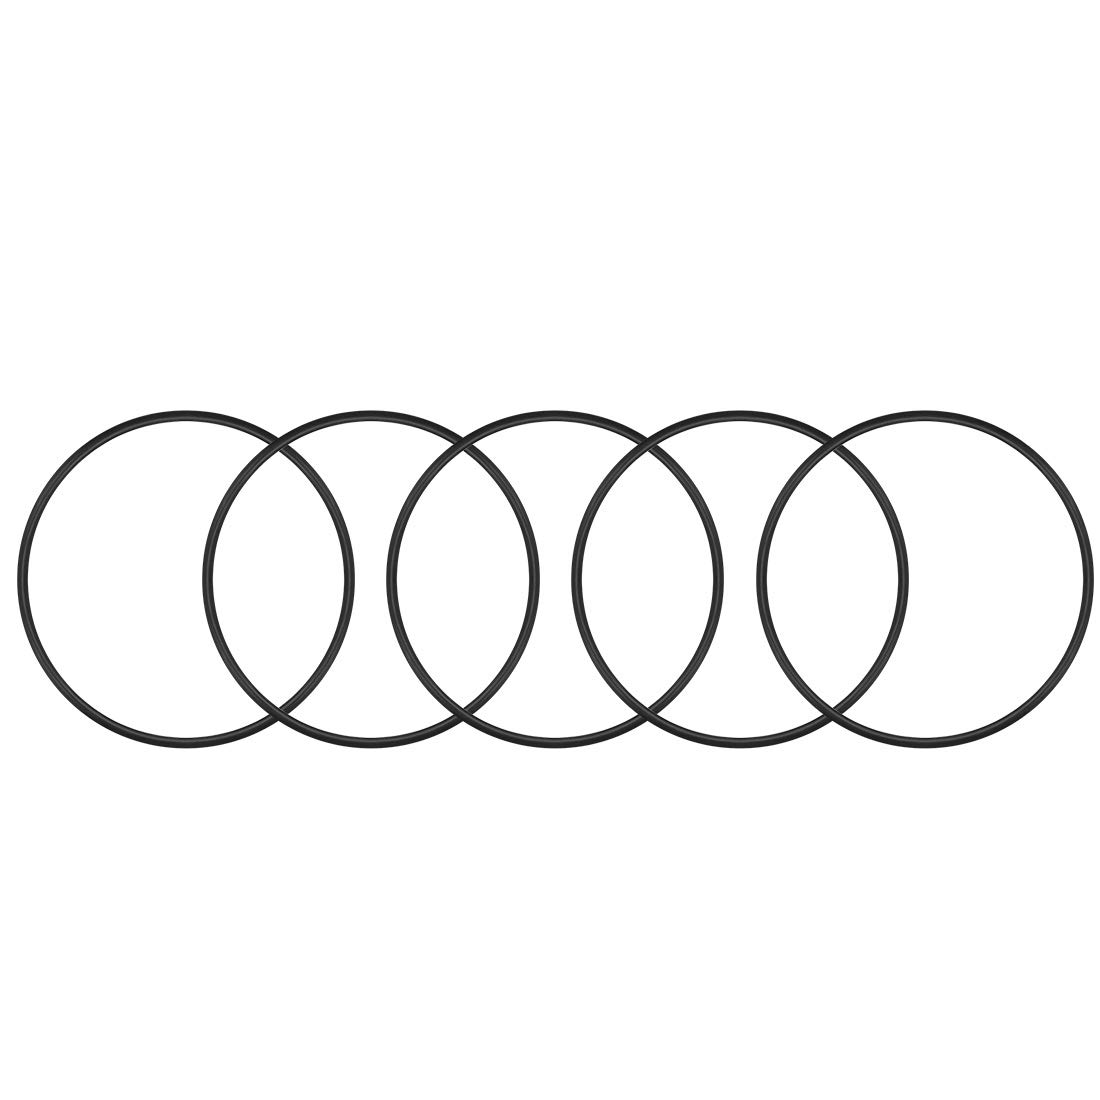 sourcing map O-ring Nitrile Gomma 103.8mm x 110mm x 3.1mm Guarnizioni anelli di tenuta 5pz